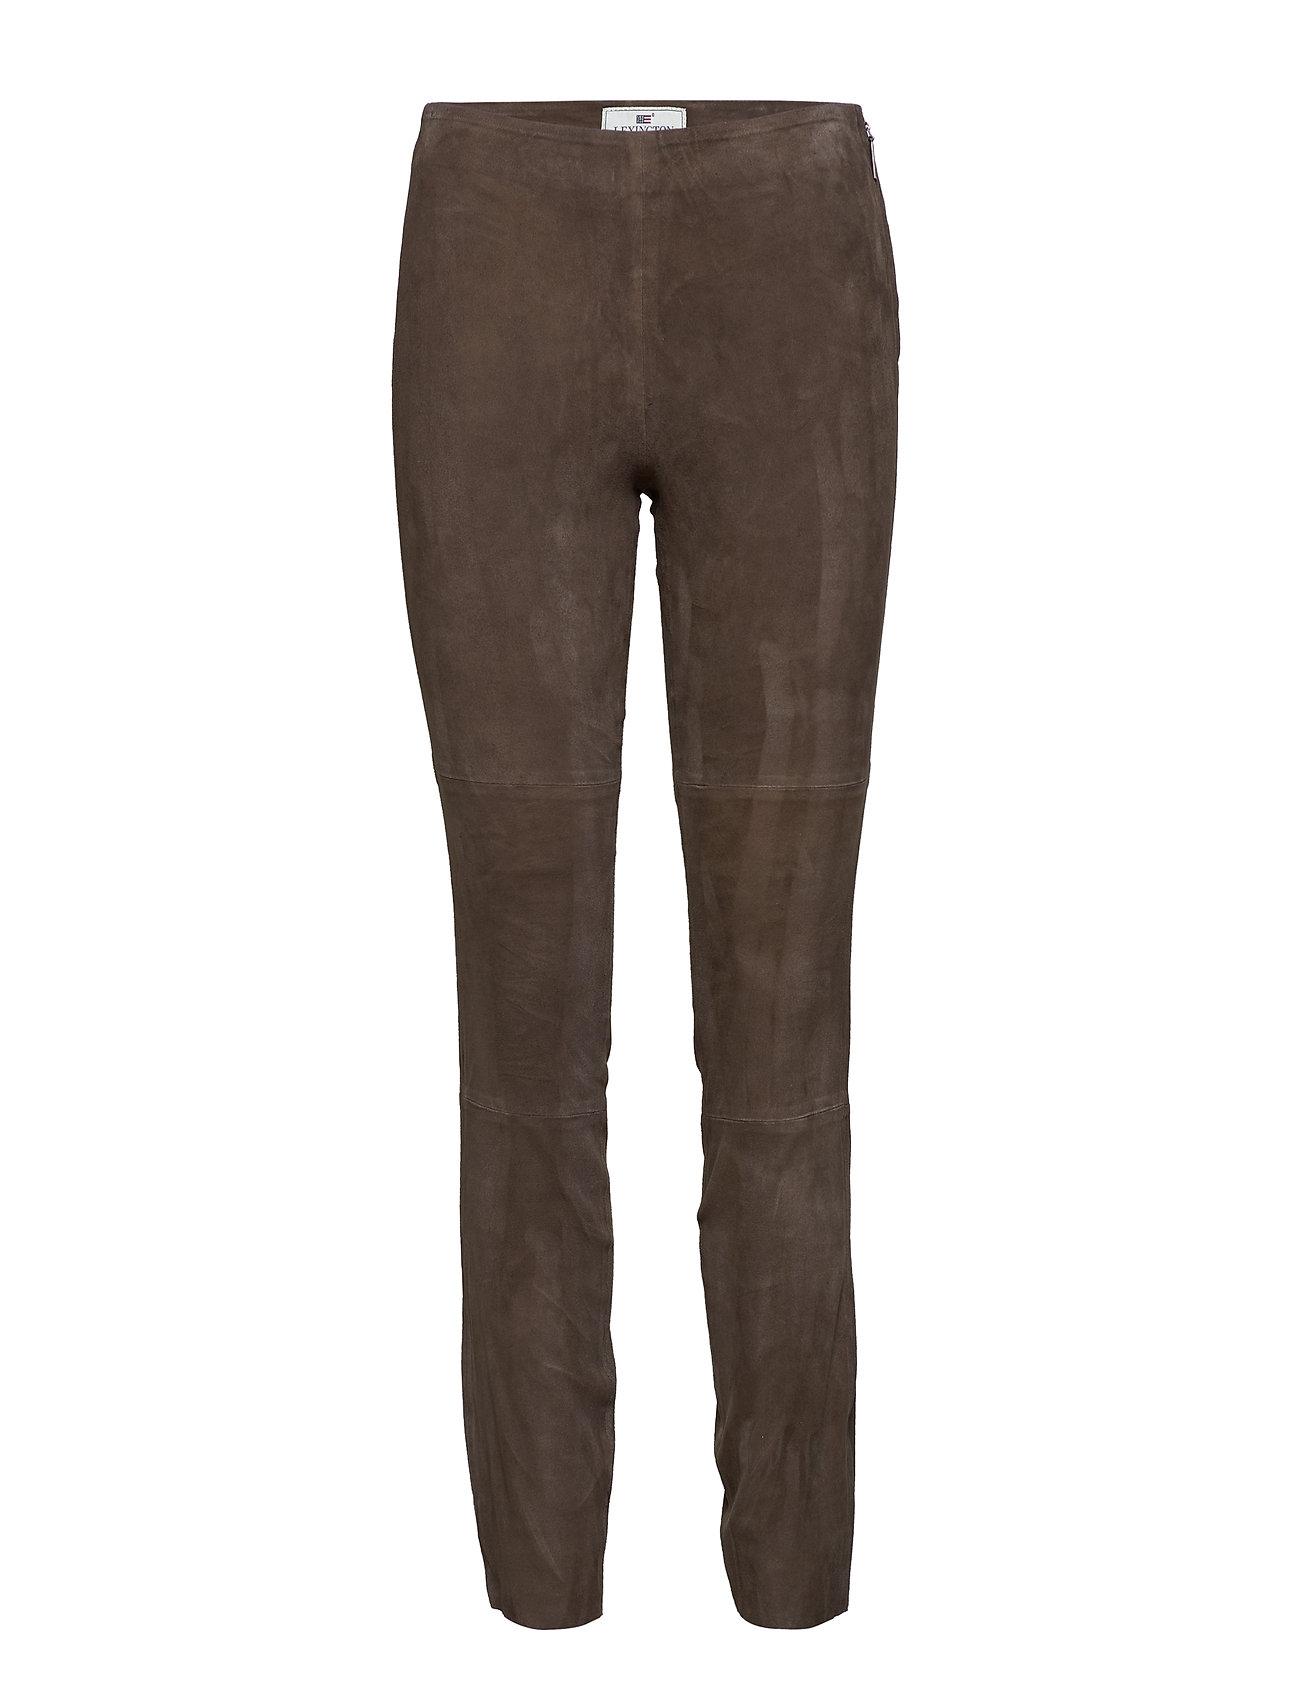 Lexington Clothing Jackie Suede Stretch Pants - DARK BROWN